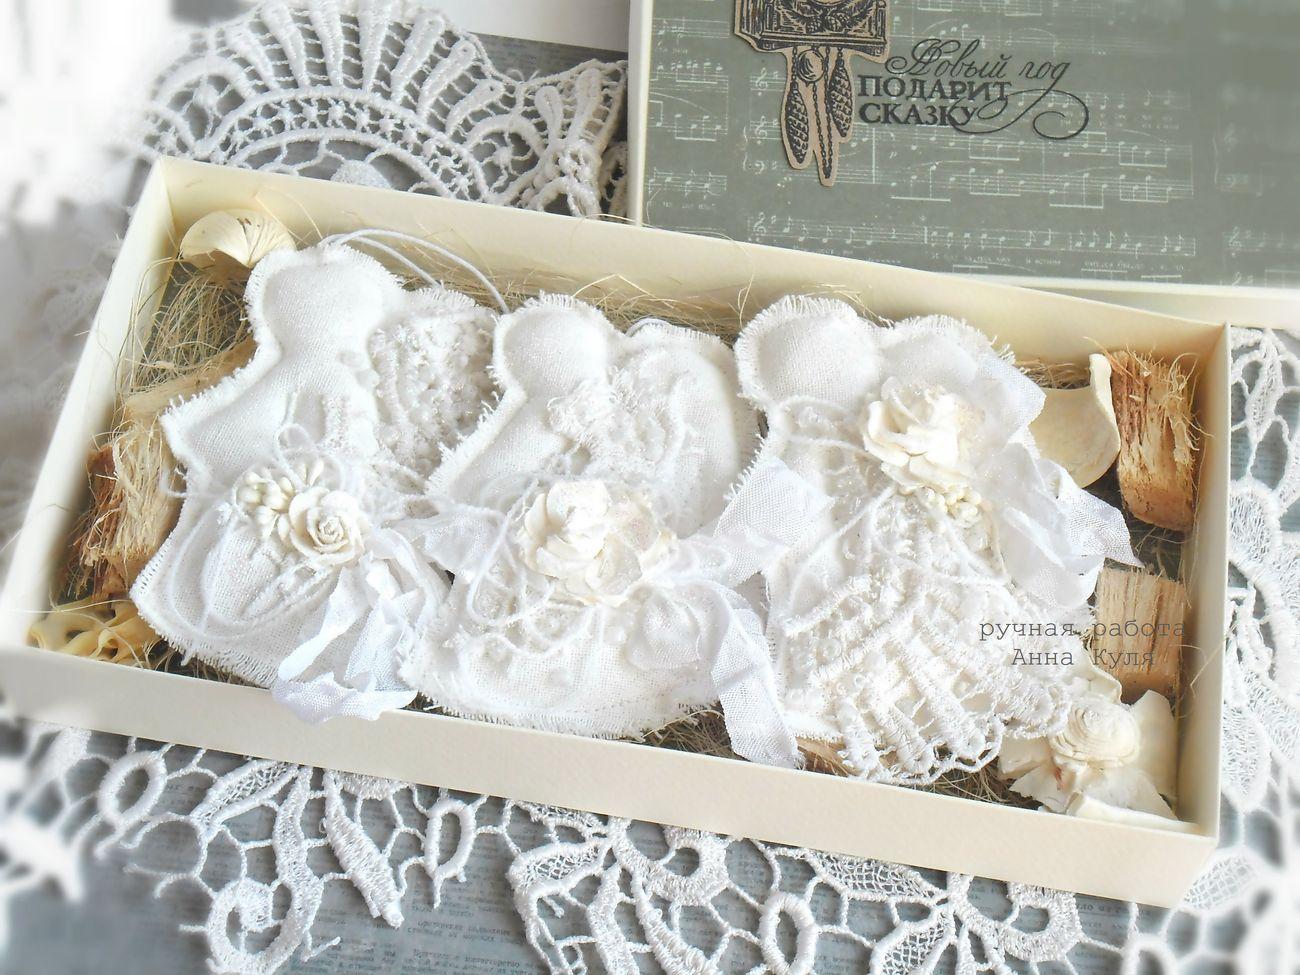 белый, ткань, кружево, красиво, подарки